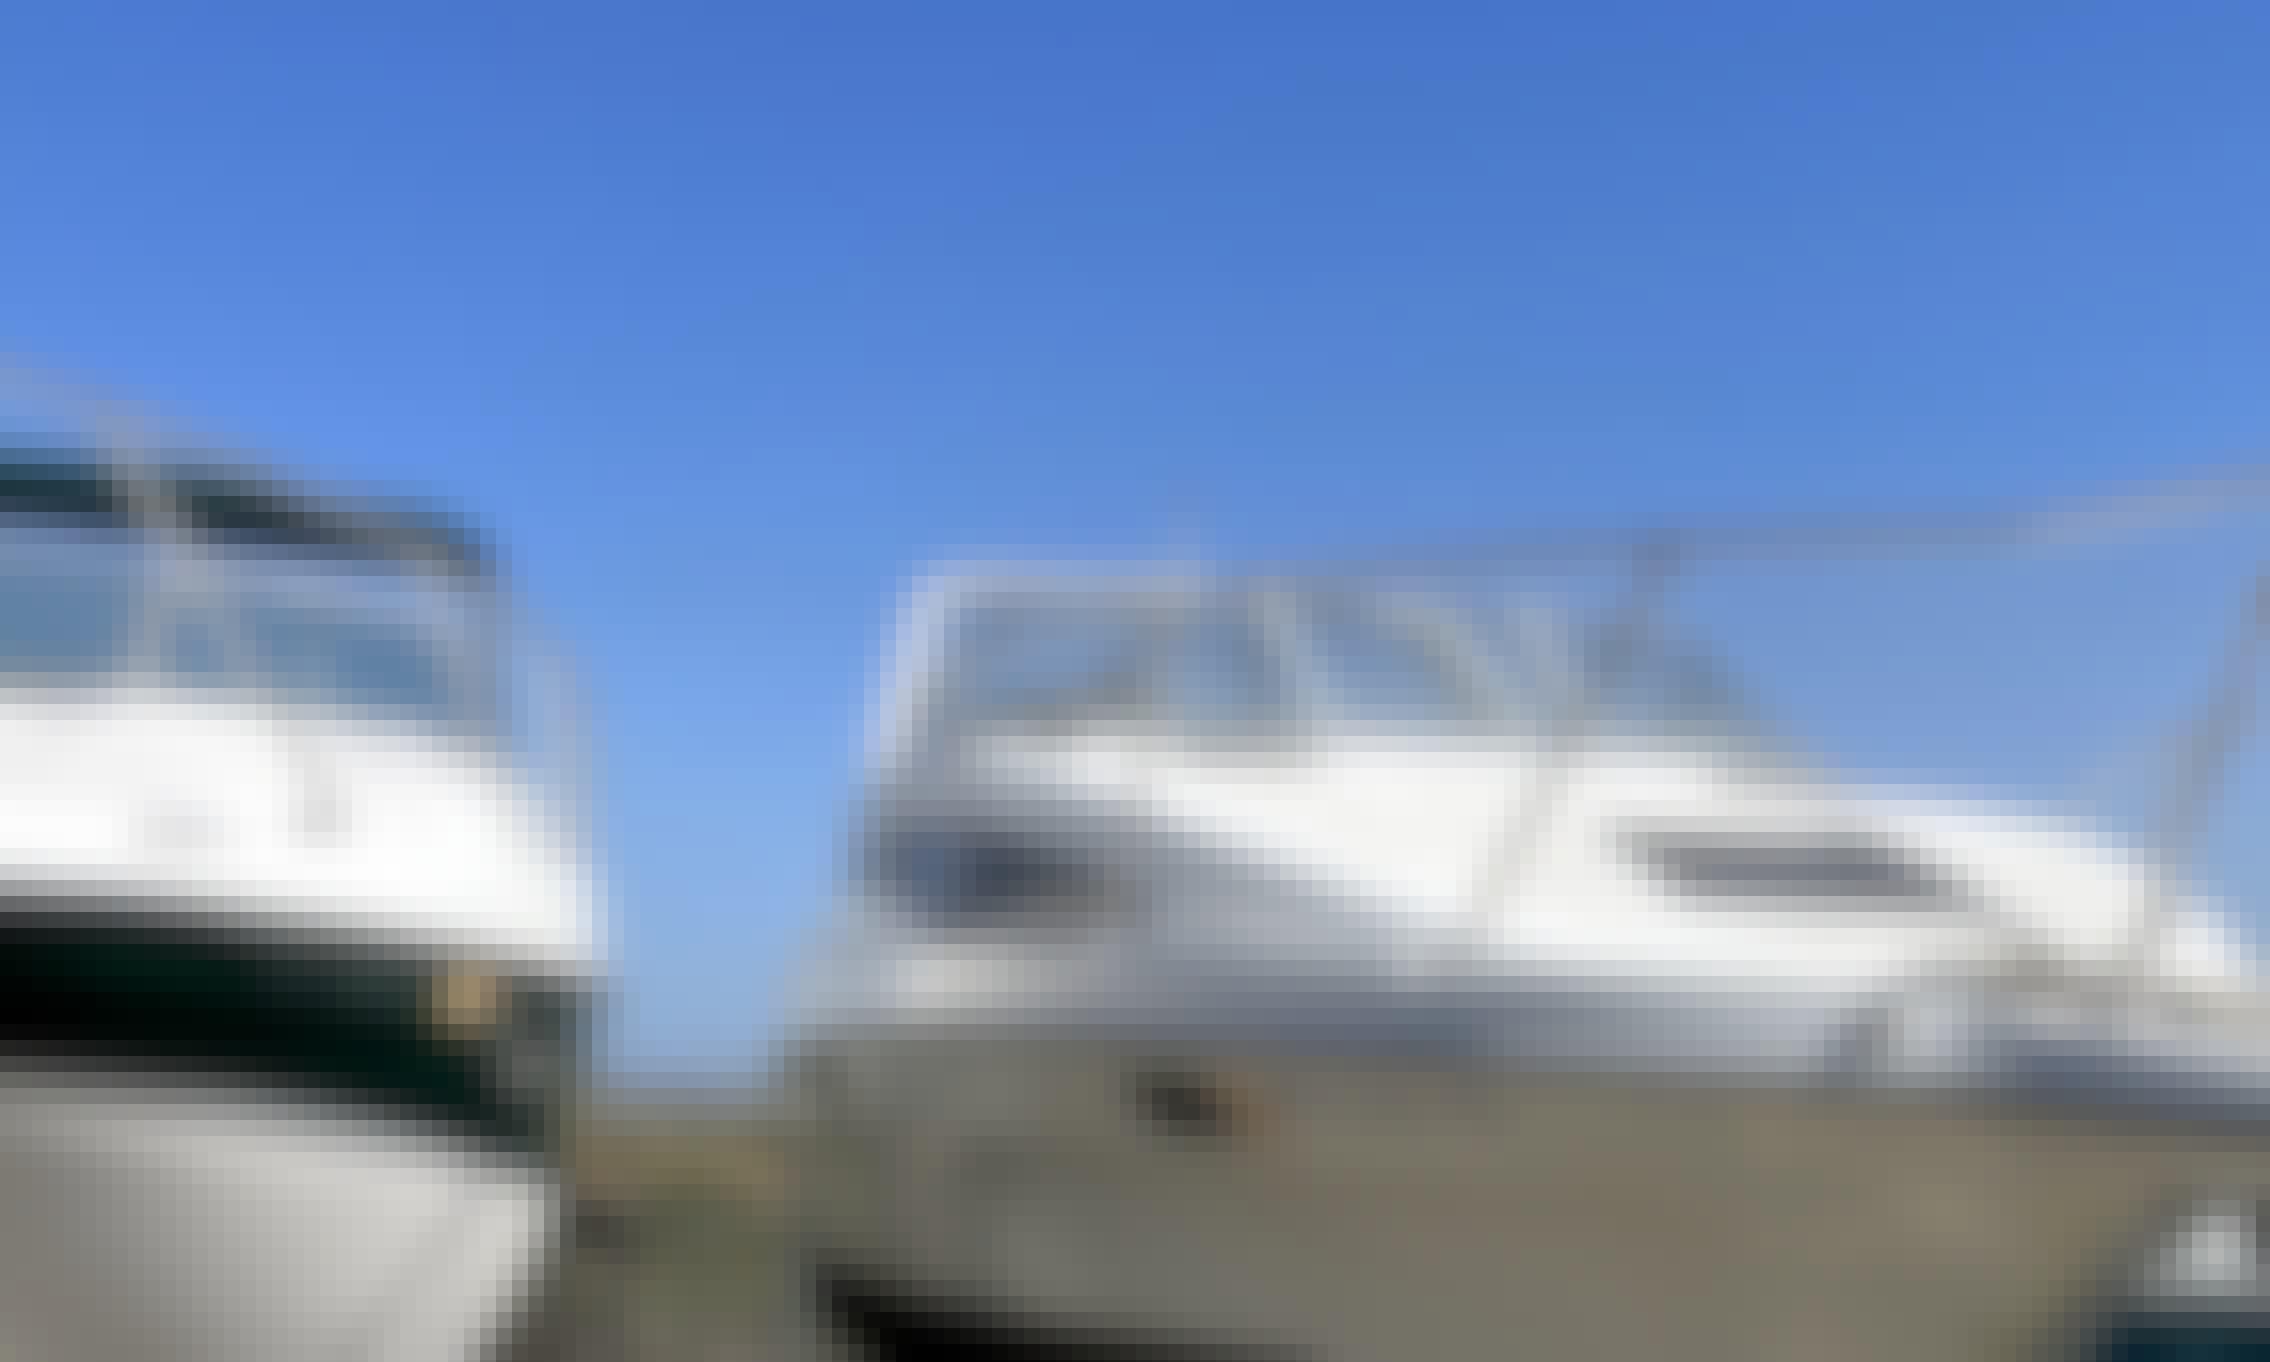 Bayliner 30' Pleasure/Fishing in Stockton CA at 5 Star Marina